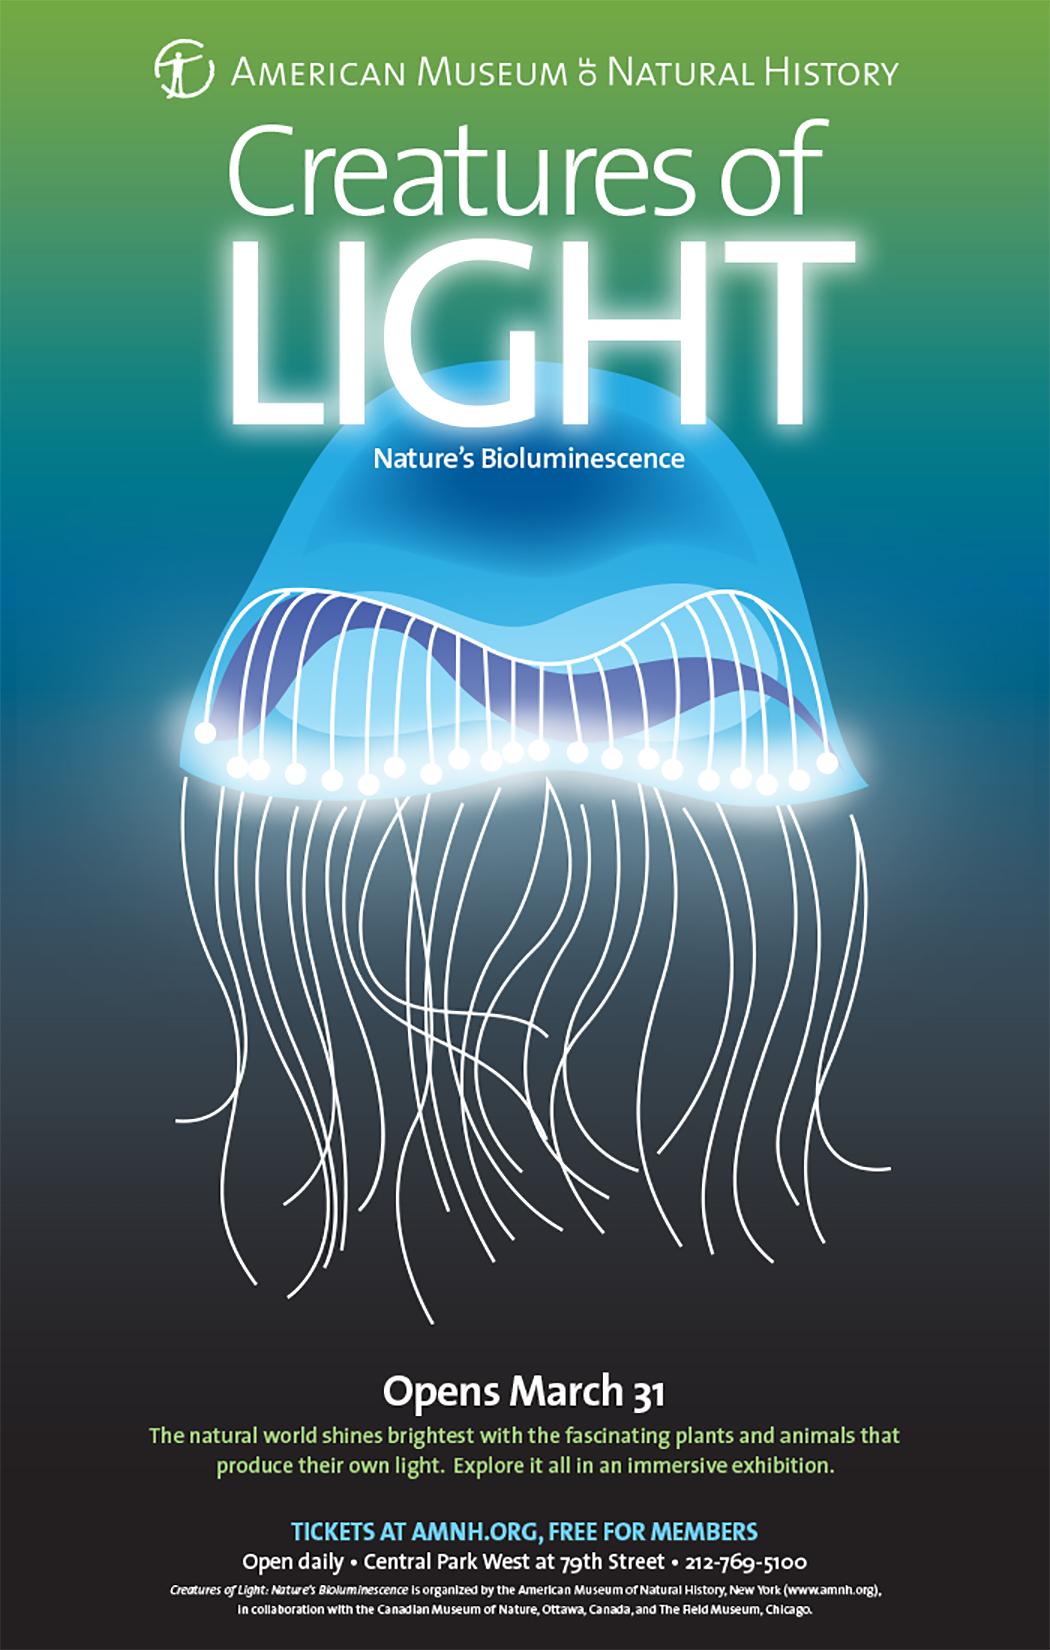 Jellyfish - American Museum & Natural History